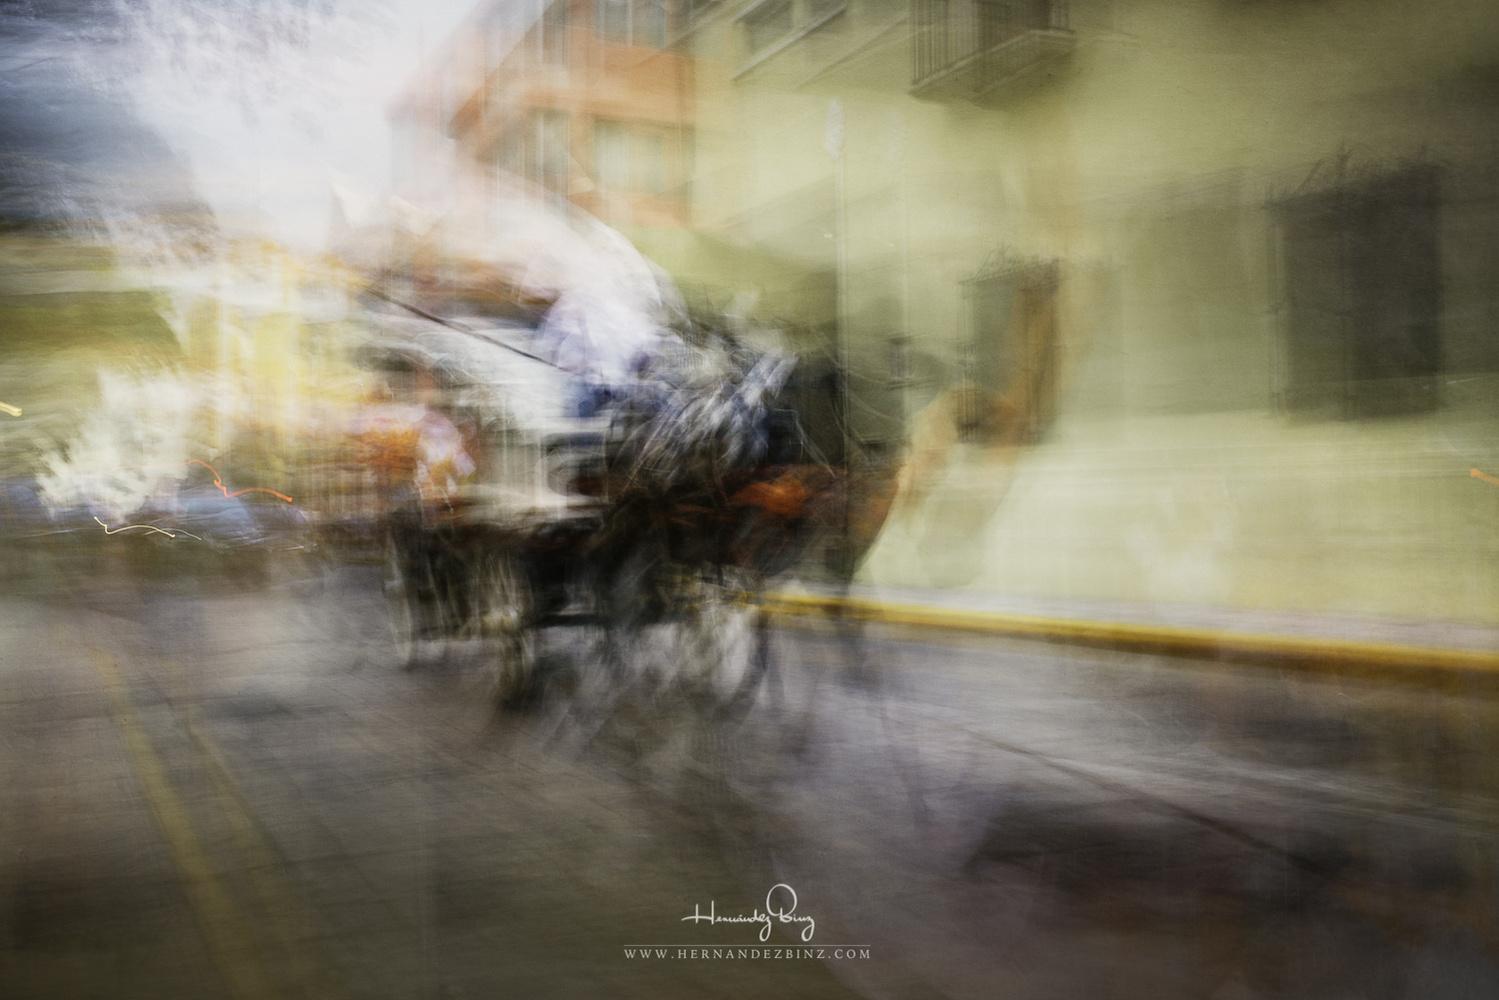 Santa Lucia's Charriots by Adrian Hernandez Binz